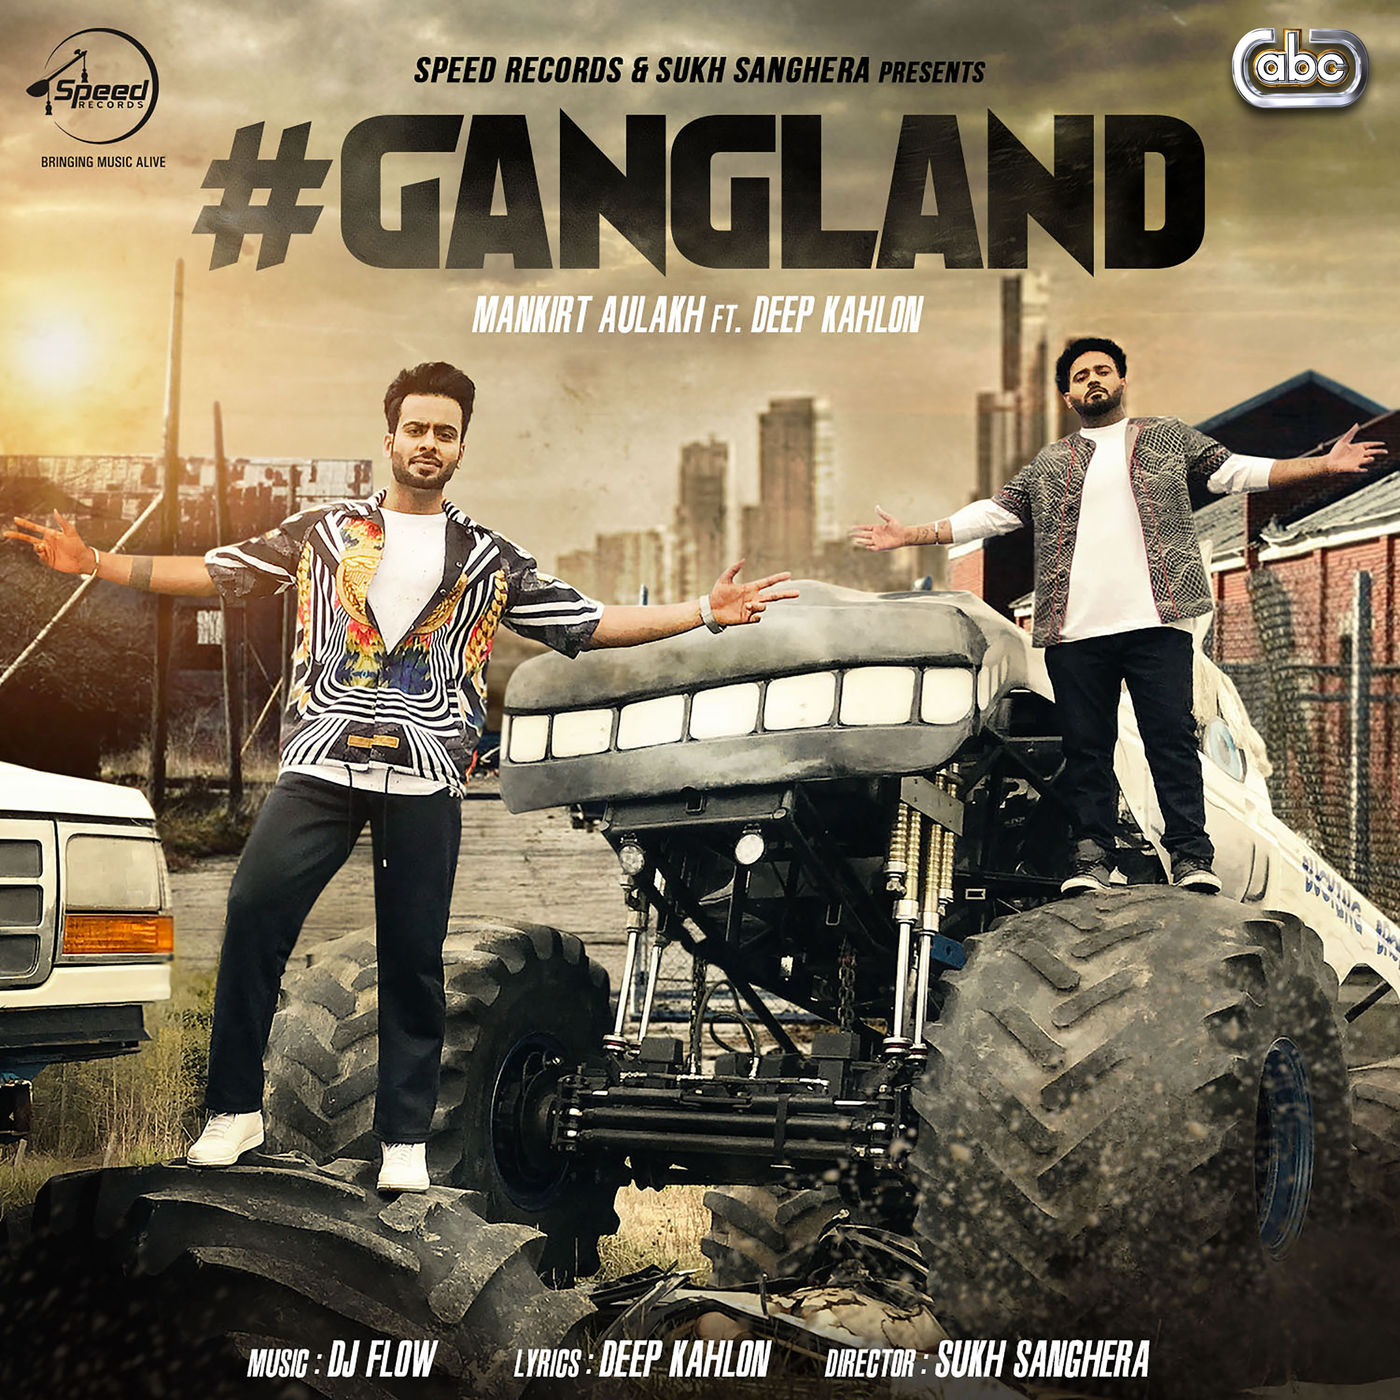 Gangland - Mankirt Aulakh